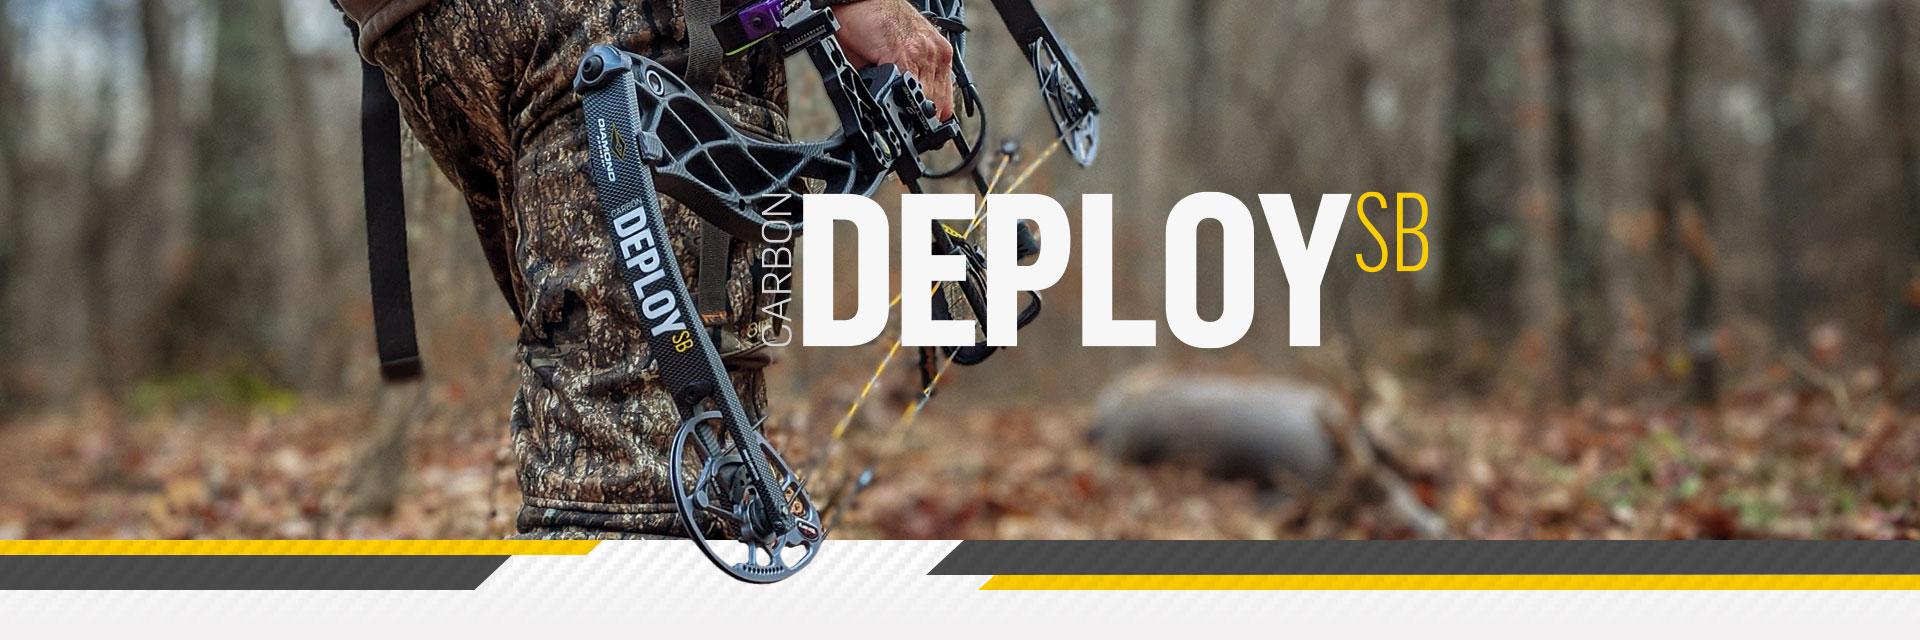 deploy sb lifestyle header image